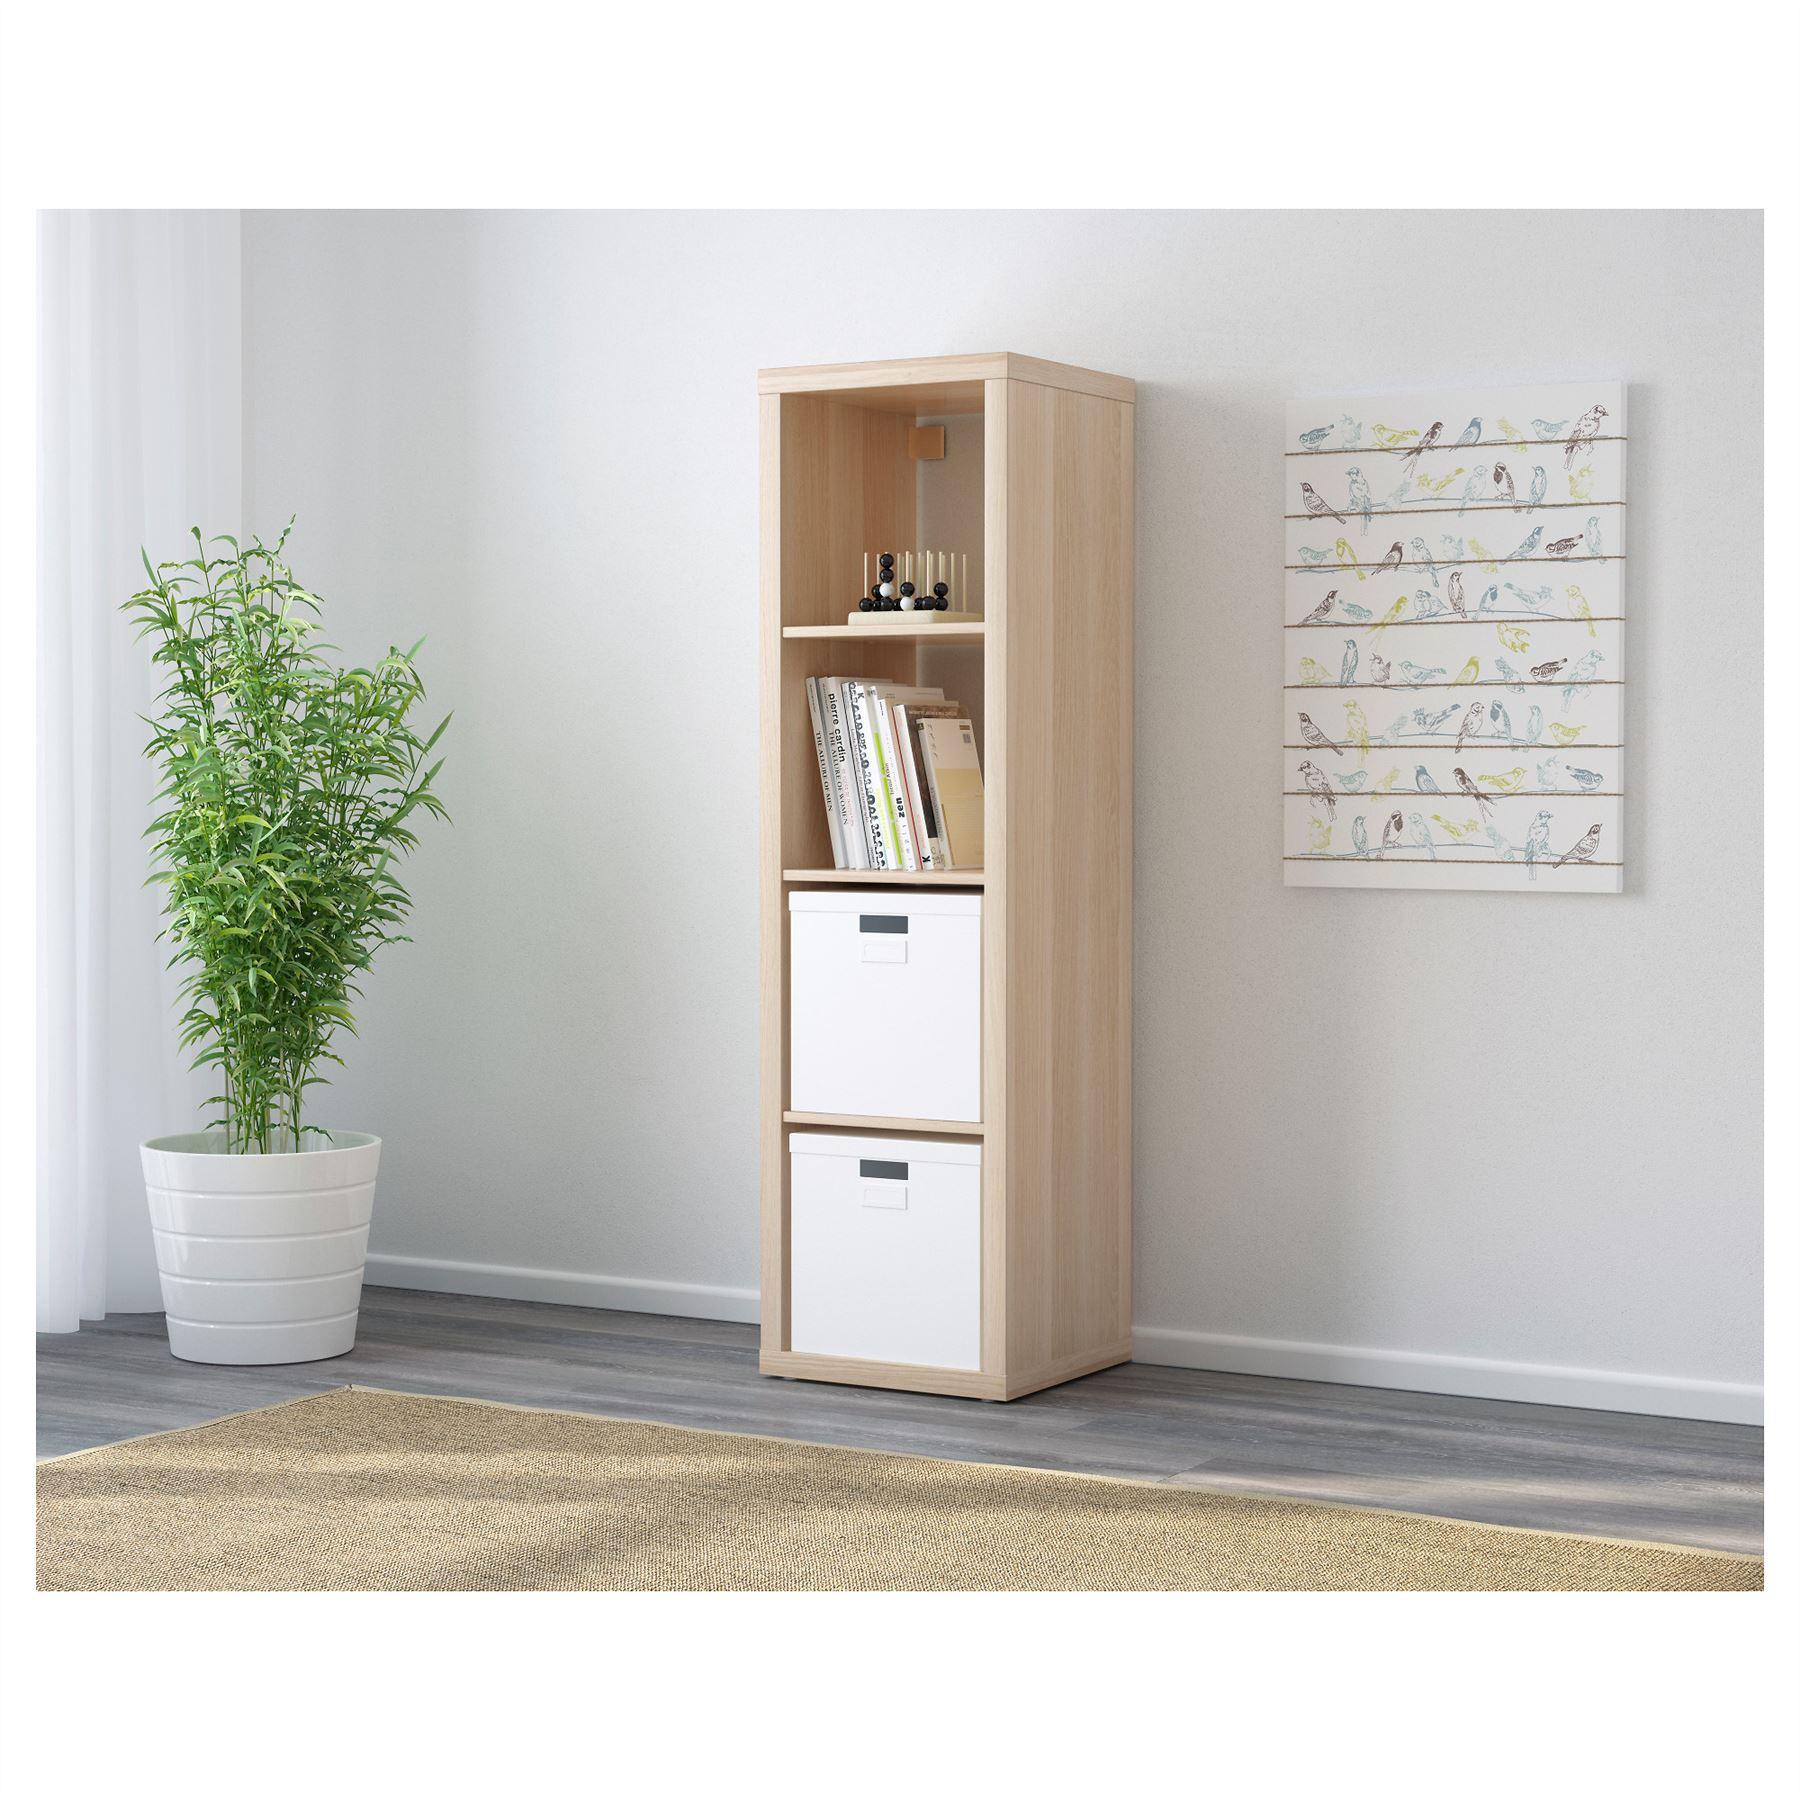 ikea kallax 4 cube storage bookcase rectangle shelving unit white oak ebay